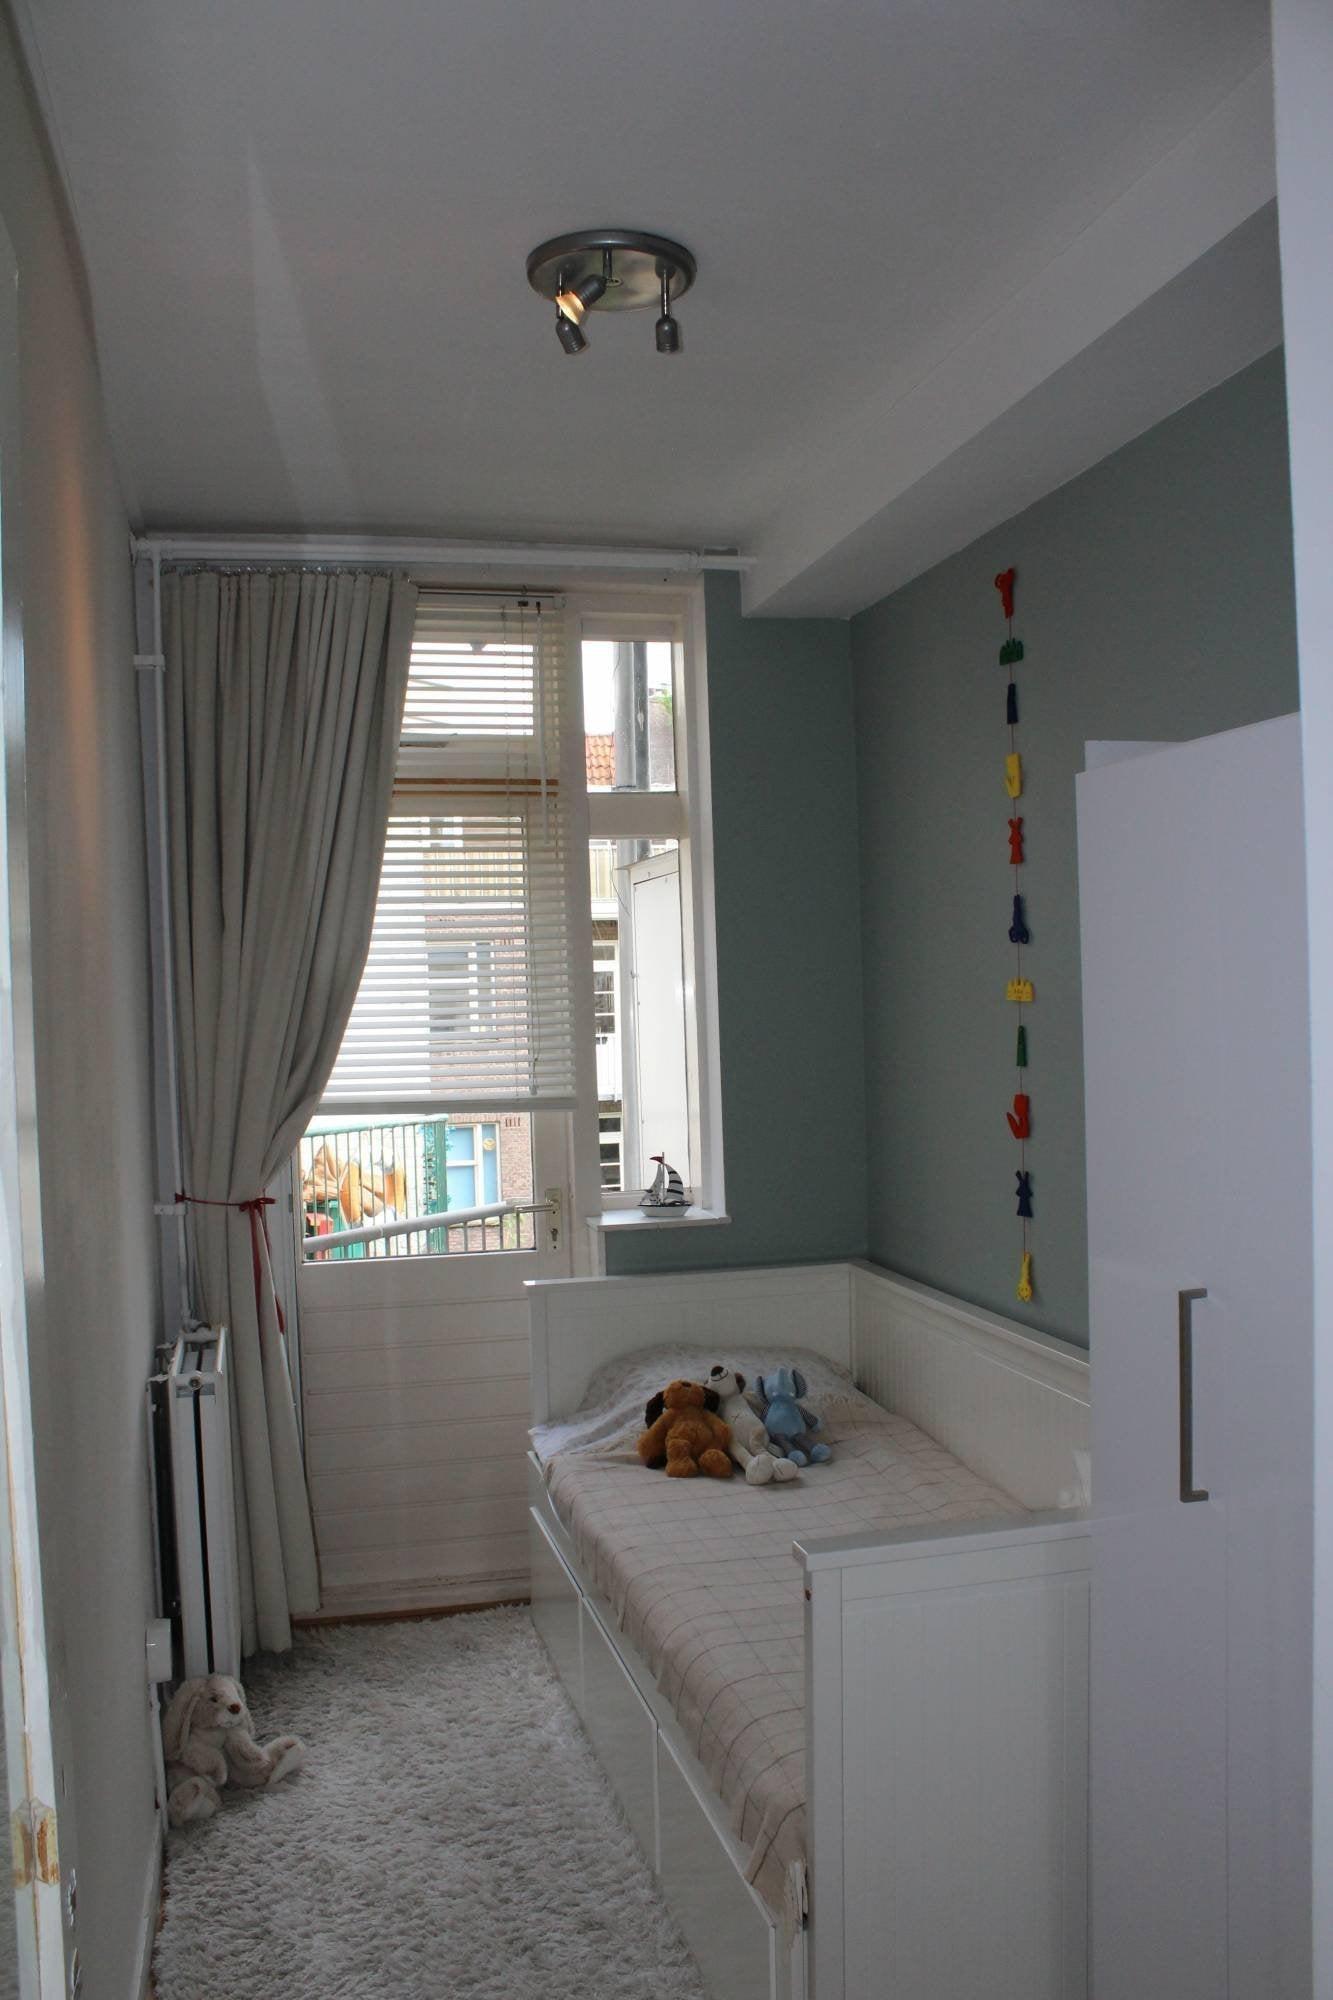 https://public.parariusoffice.nl/15/photos/huge/3469115.1474546984-45.JPG